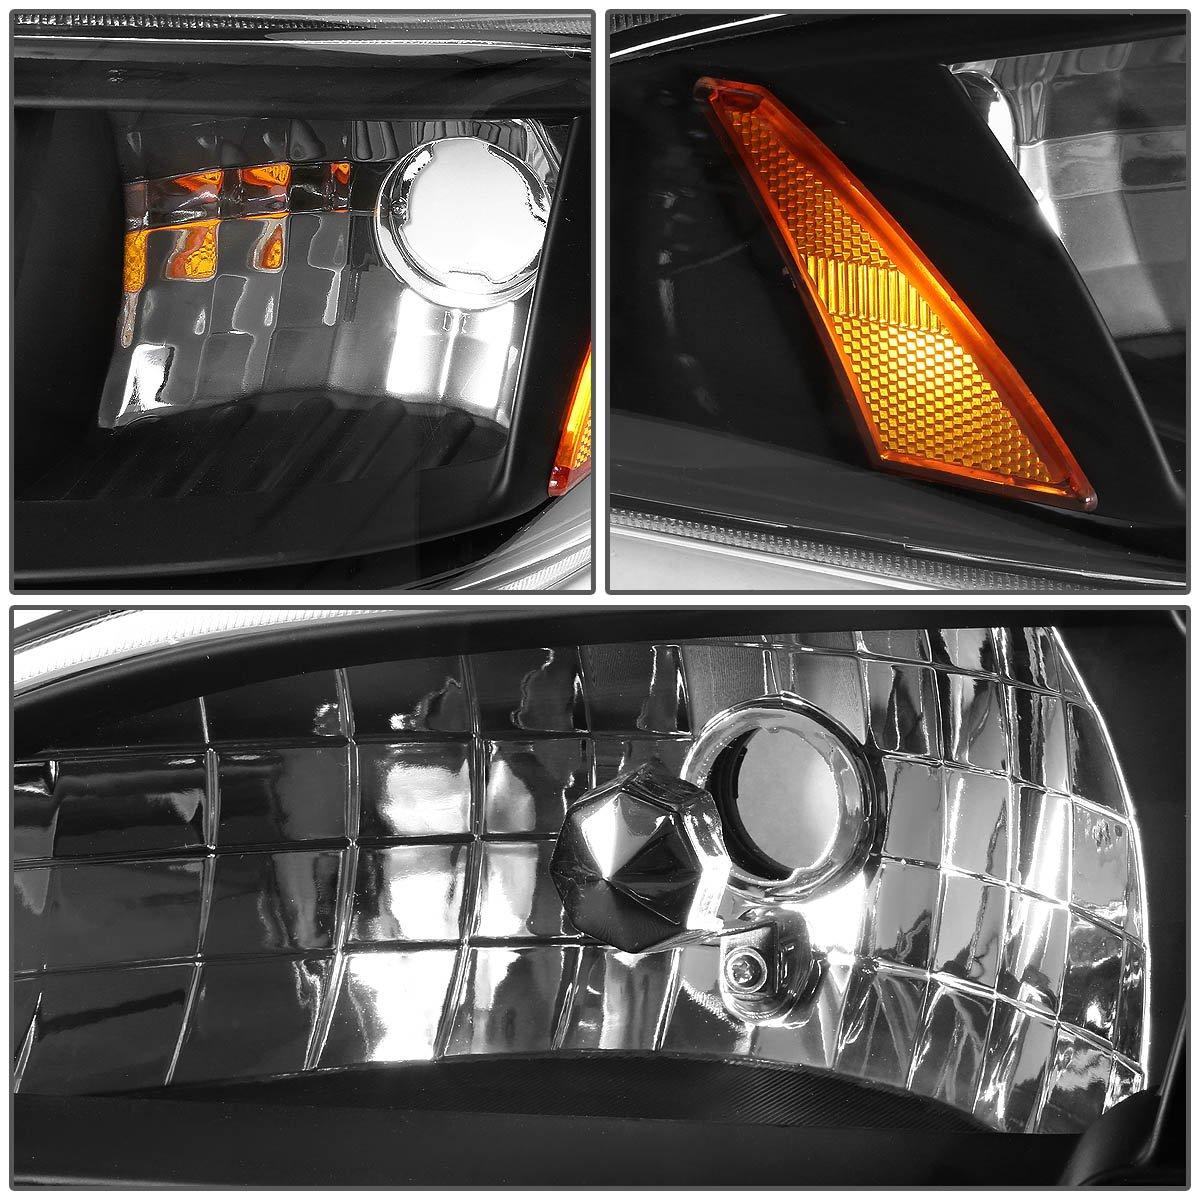 DNA Motoring HL-OH-F15092-6P-BK-AM Headlight Assembly Driver /& Passenger Side